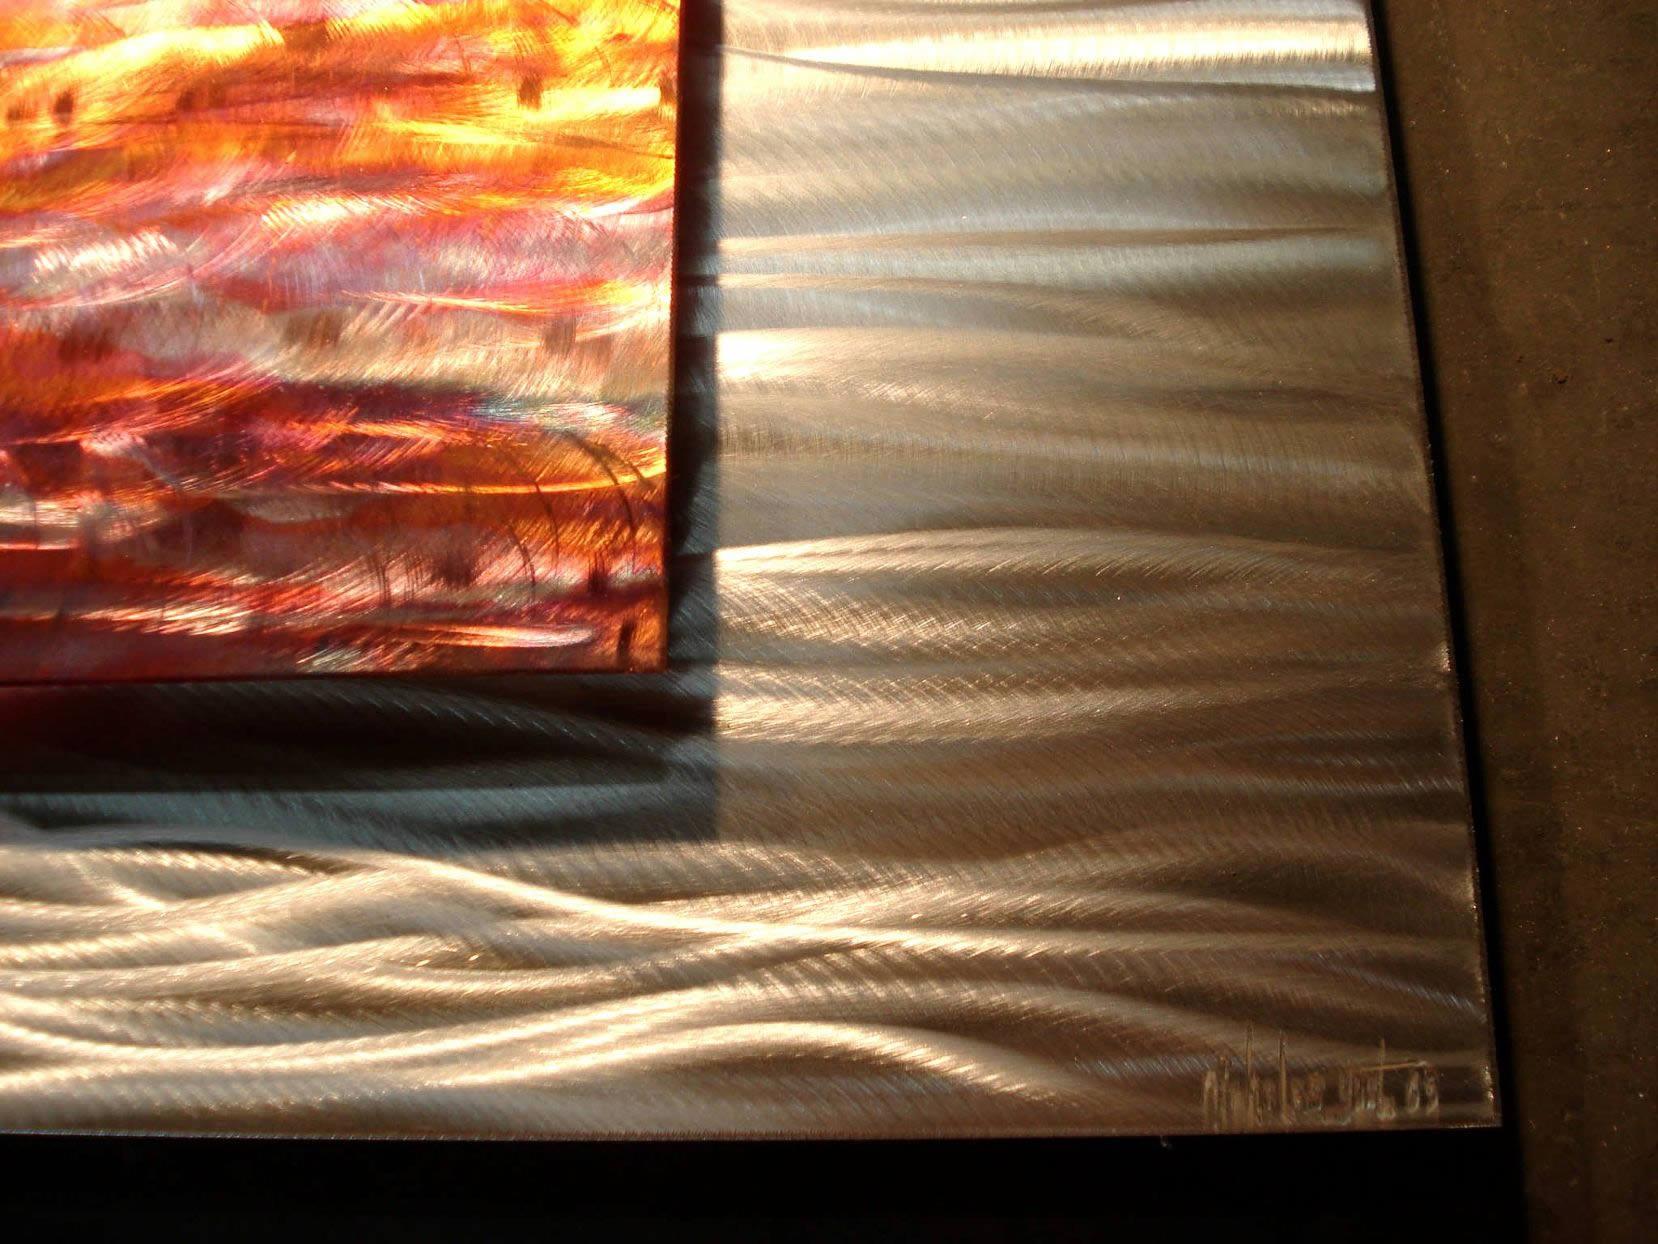 NY0619M - Metal Art by Nicholas Yust, Alternate Angle 2